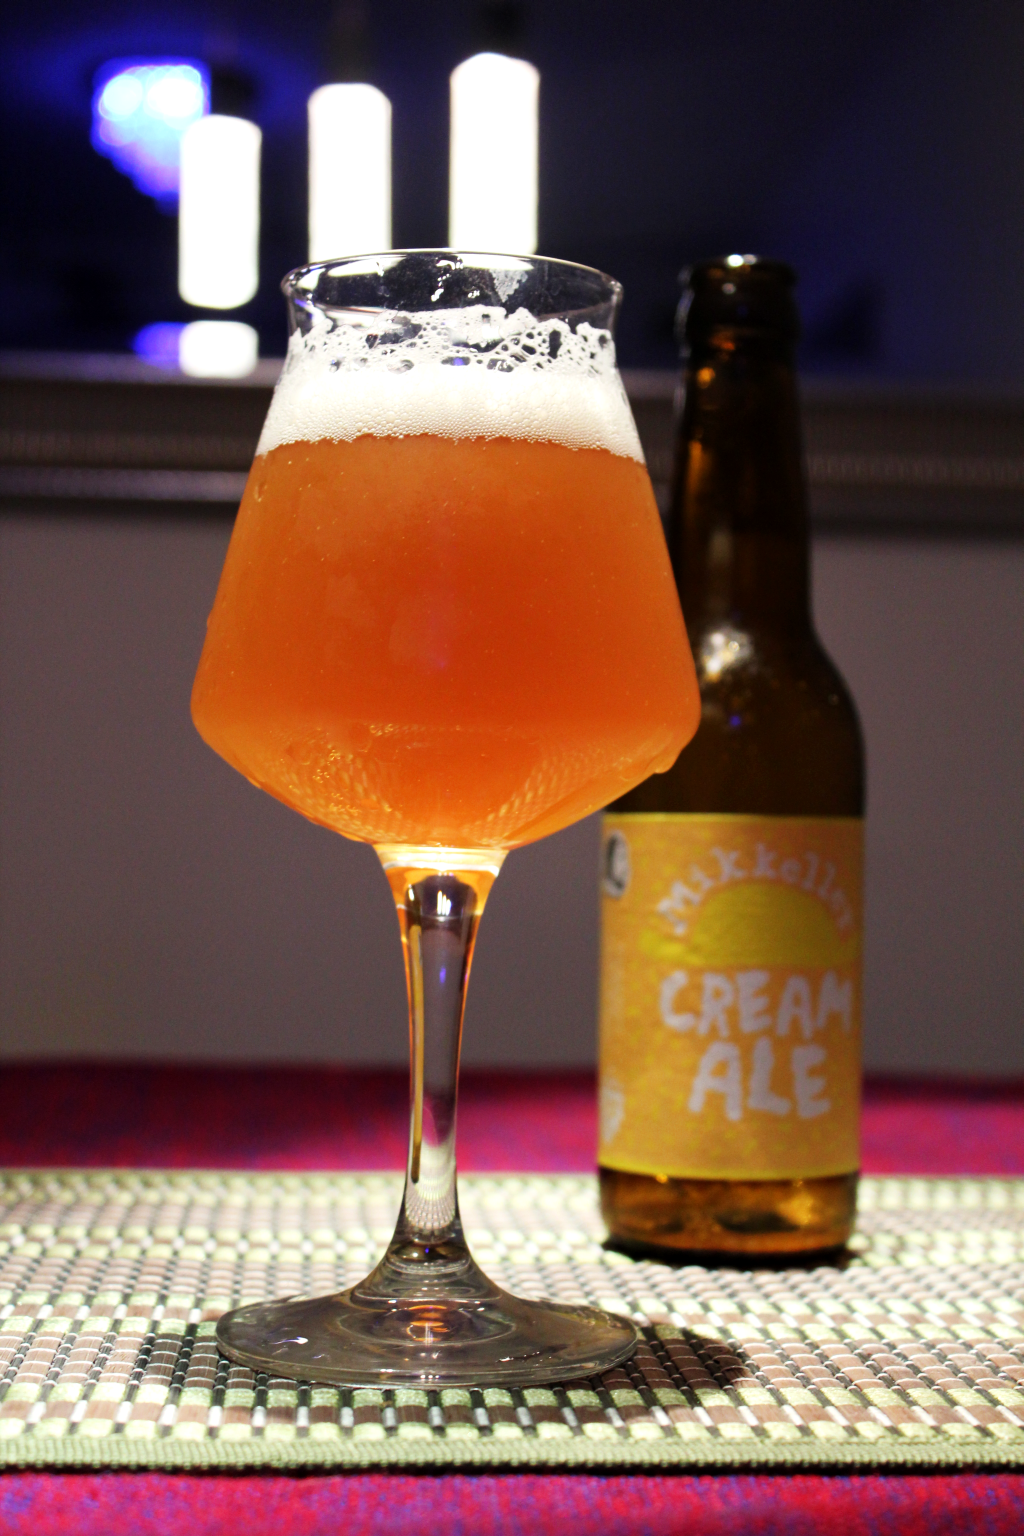 mikkeller-cream-ale-piwolucja-review